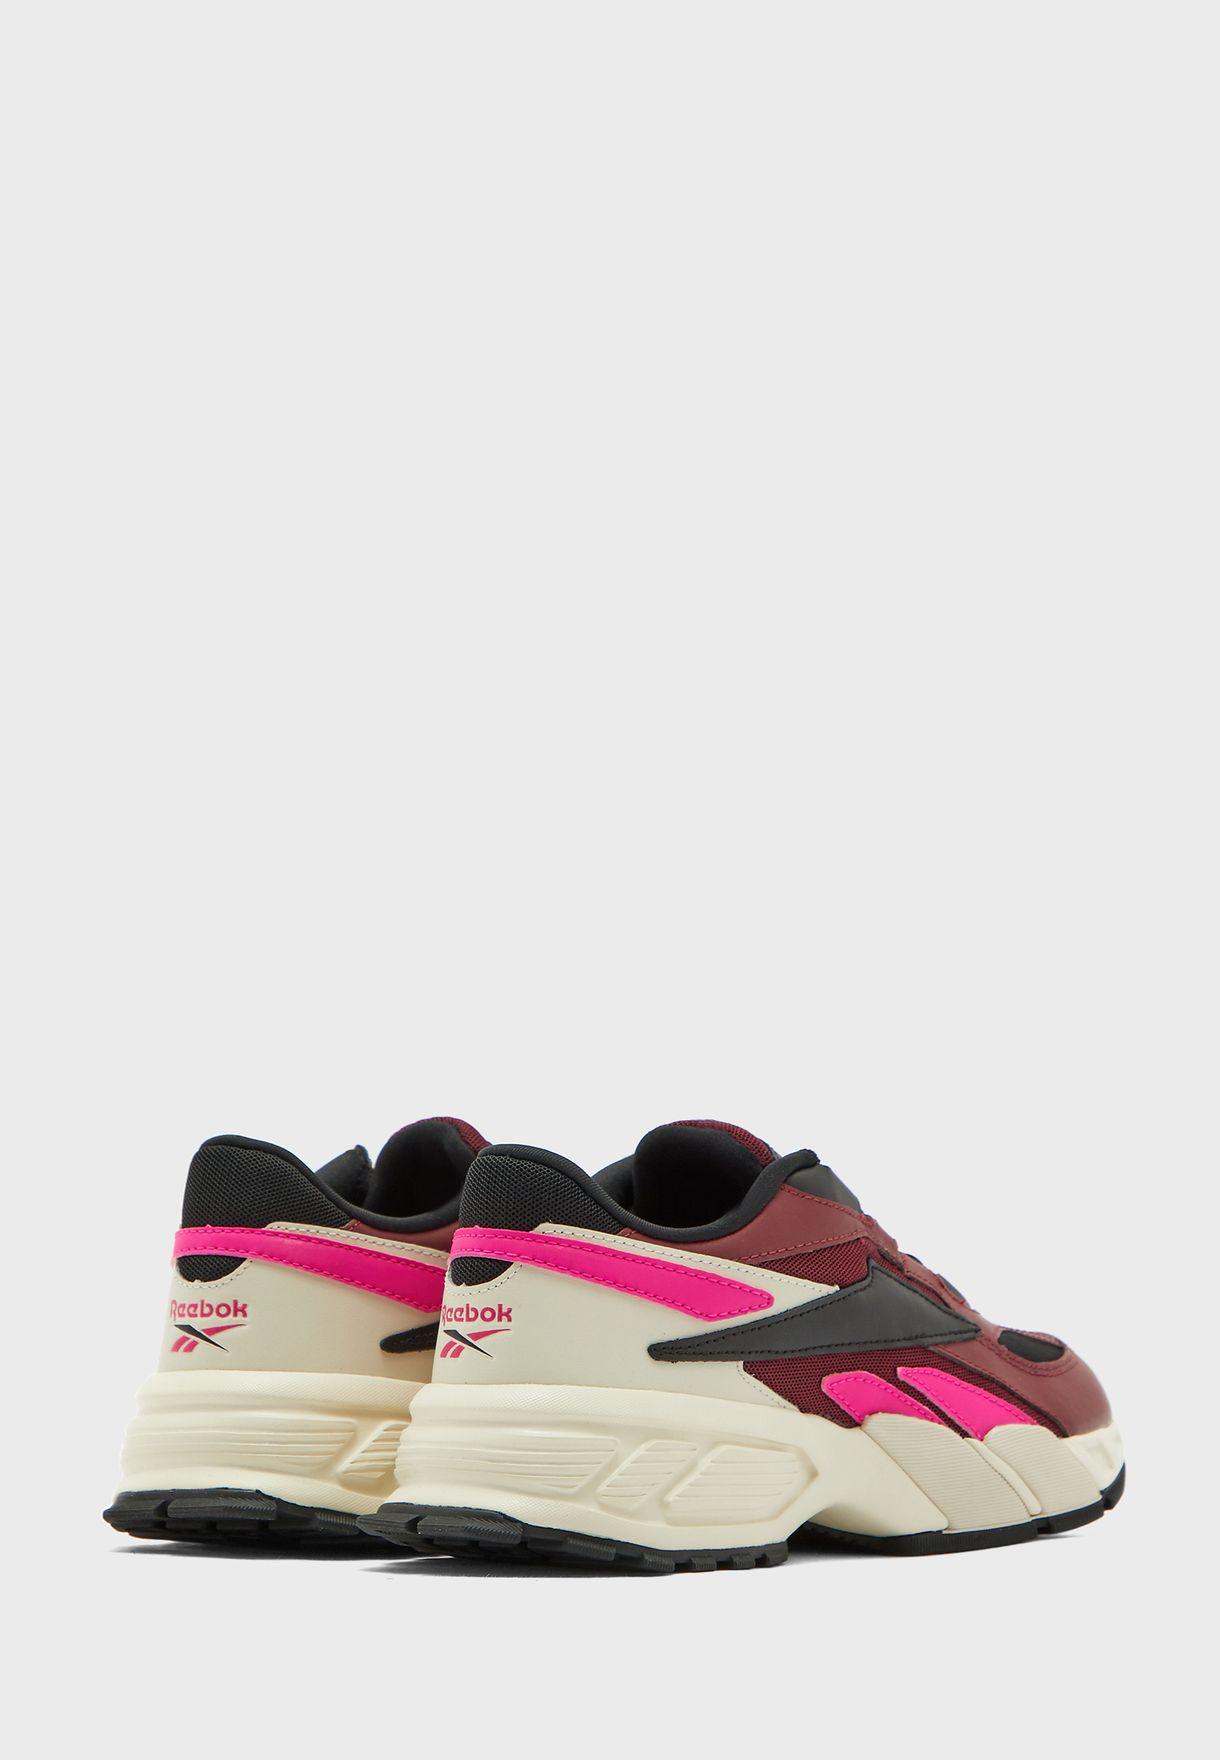 Evzn Foundation Sports Women's Shoes